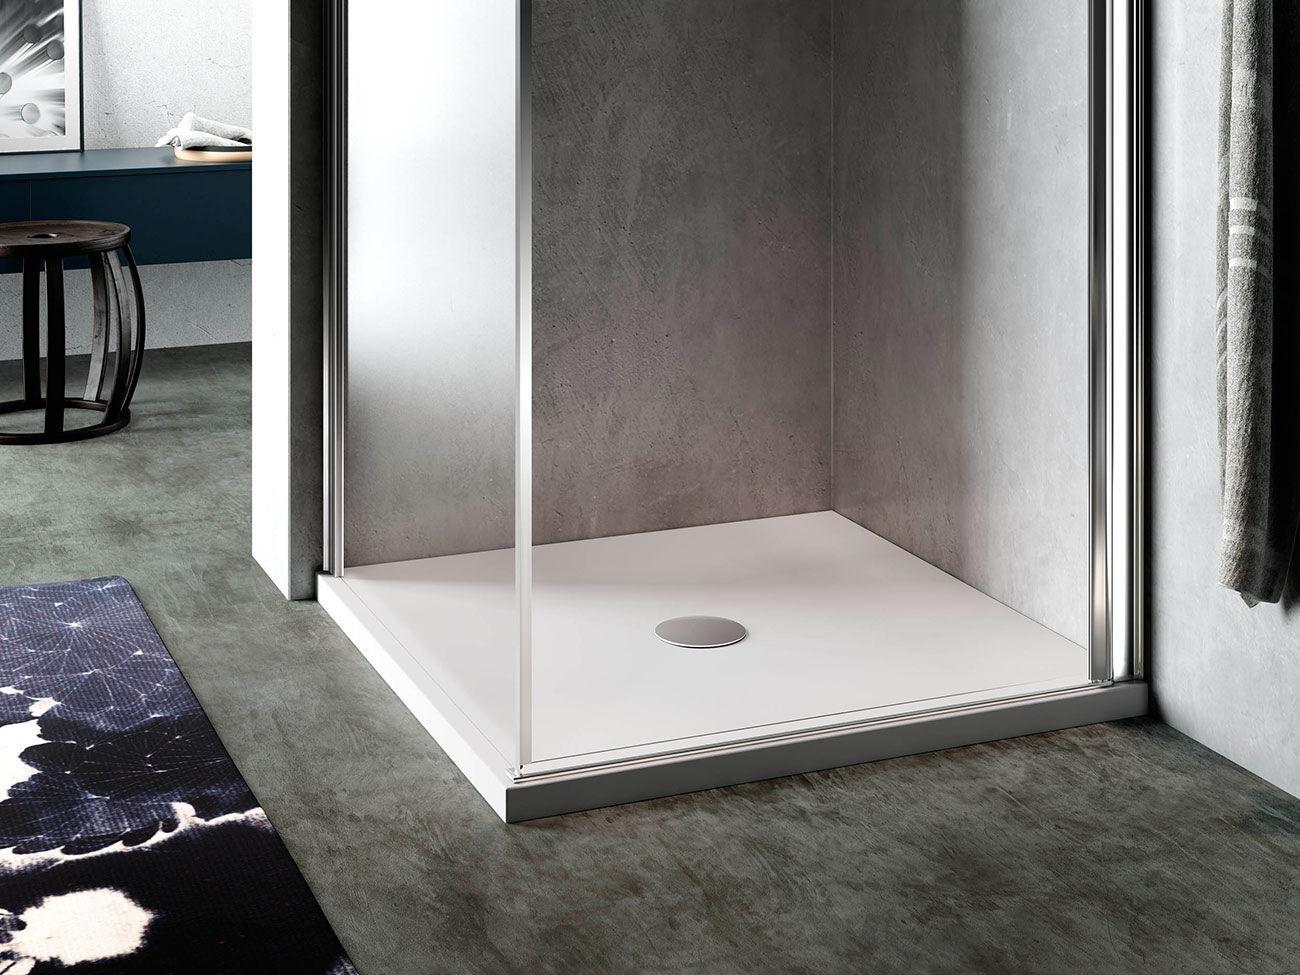 rectangular shower base acrylic with extraflat drain planor glass